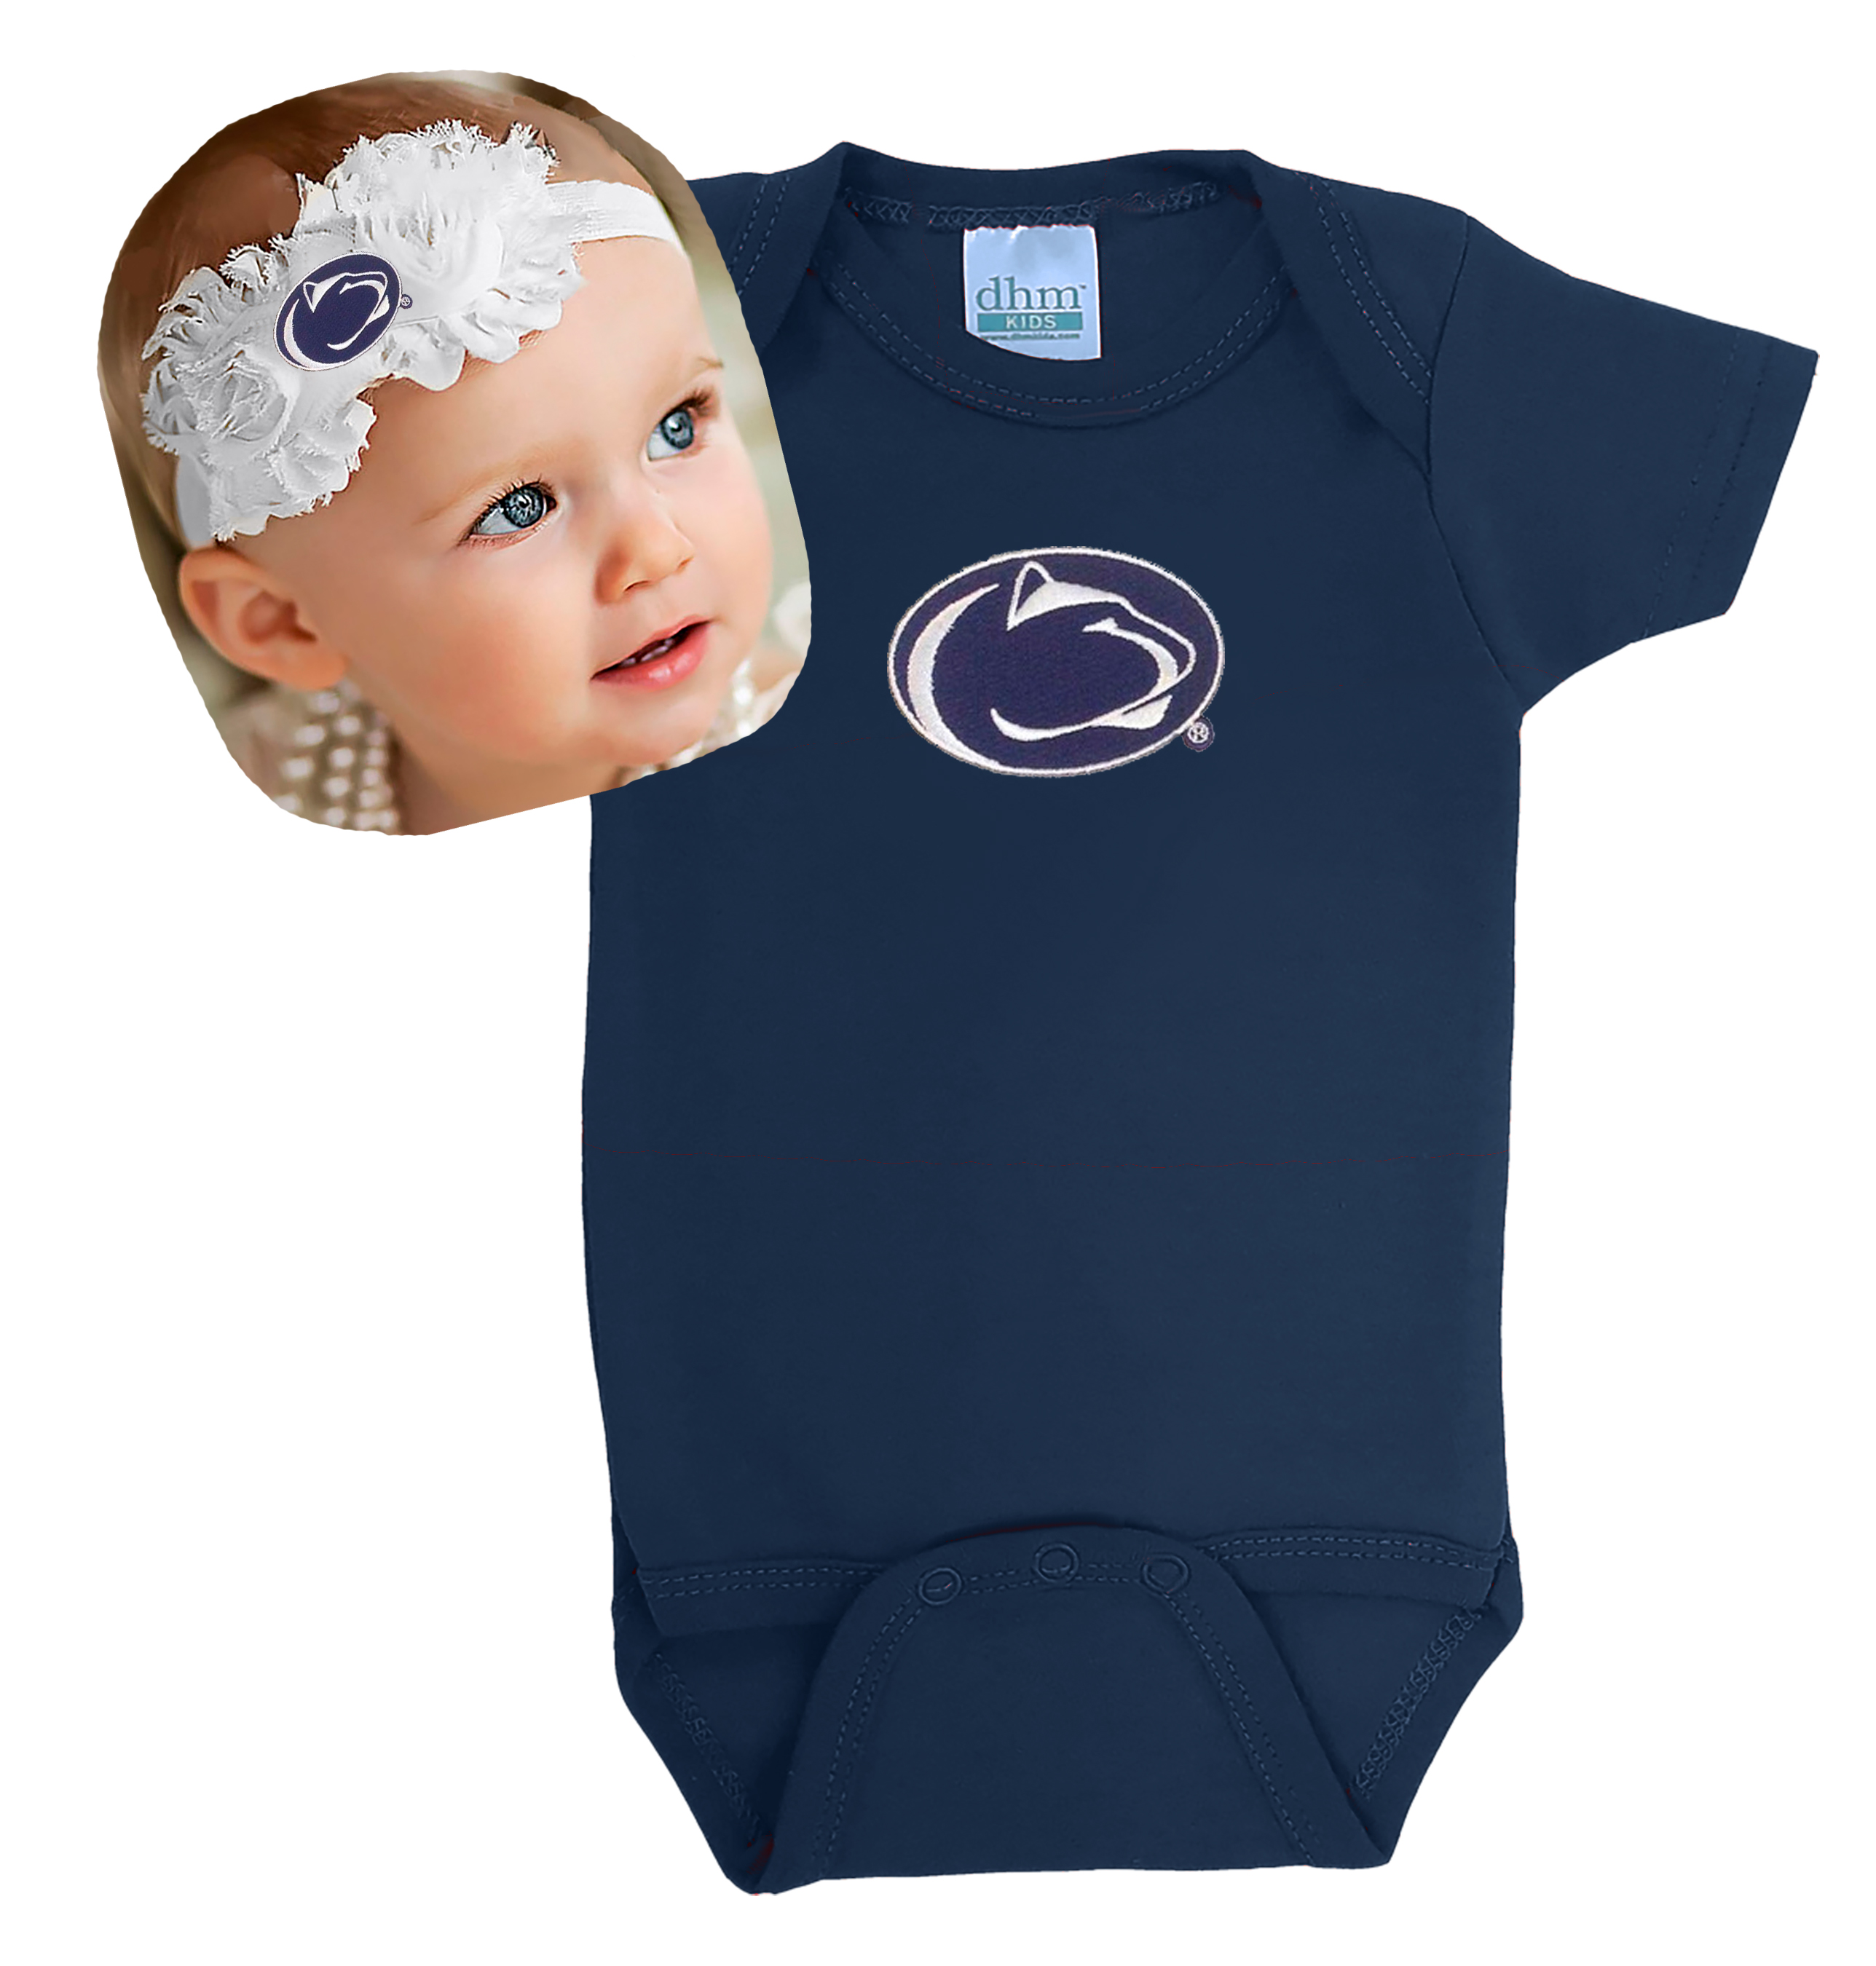 Penn State Nittany Lions Baby Bodysuit and Shabby Flower Headband Set